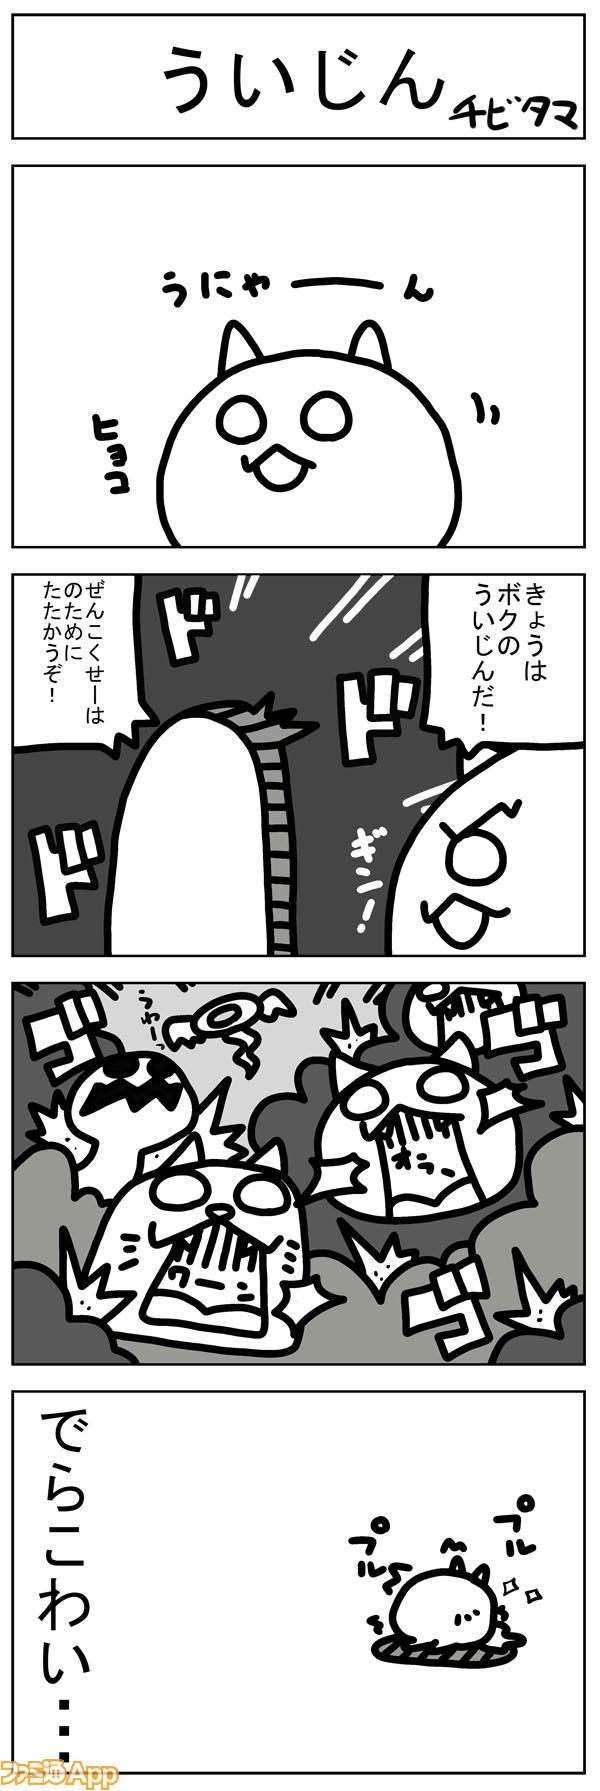 13tibi_001